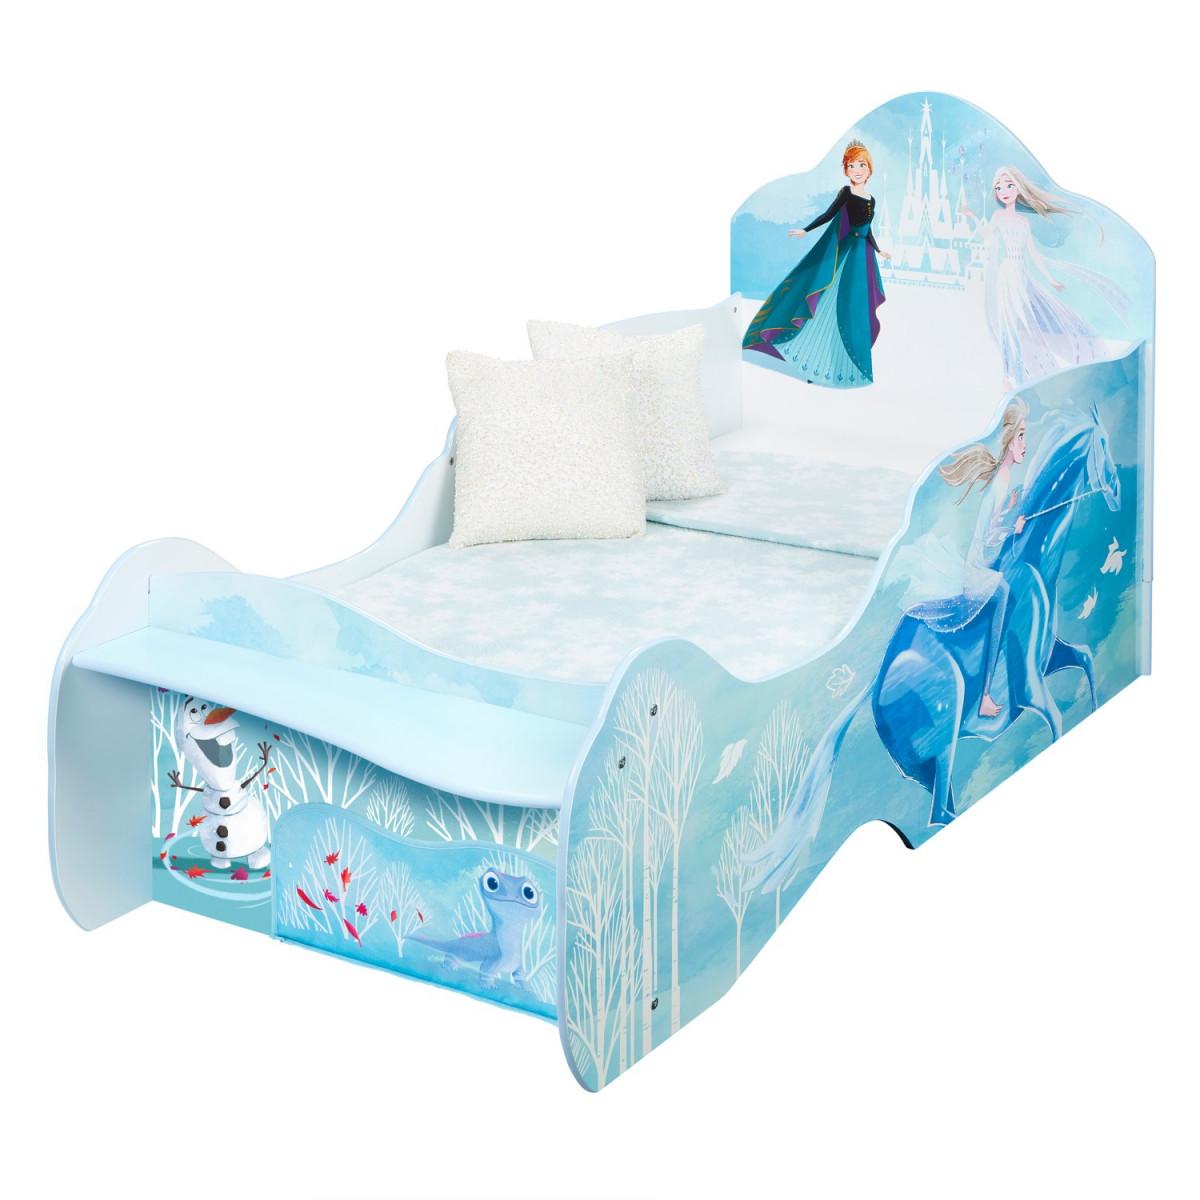 lit-reine-neiges-traineau-bleu